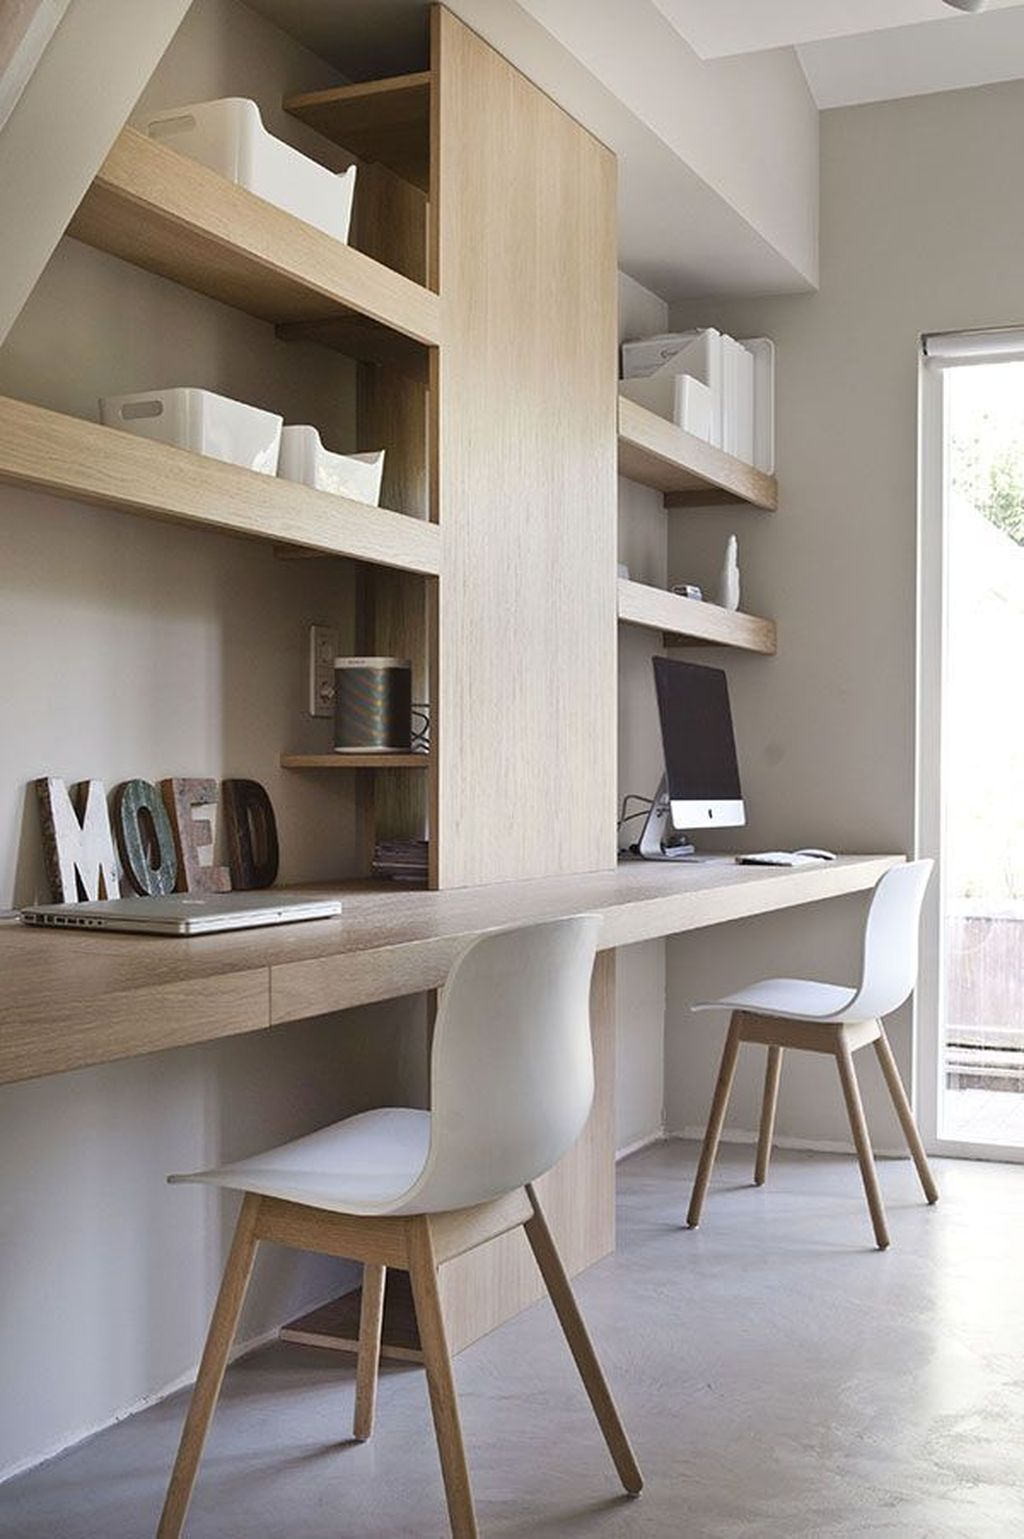 Inspiring Double Desk Home Office Design Ideas 28